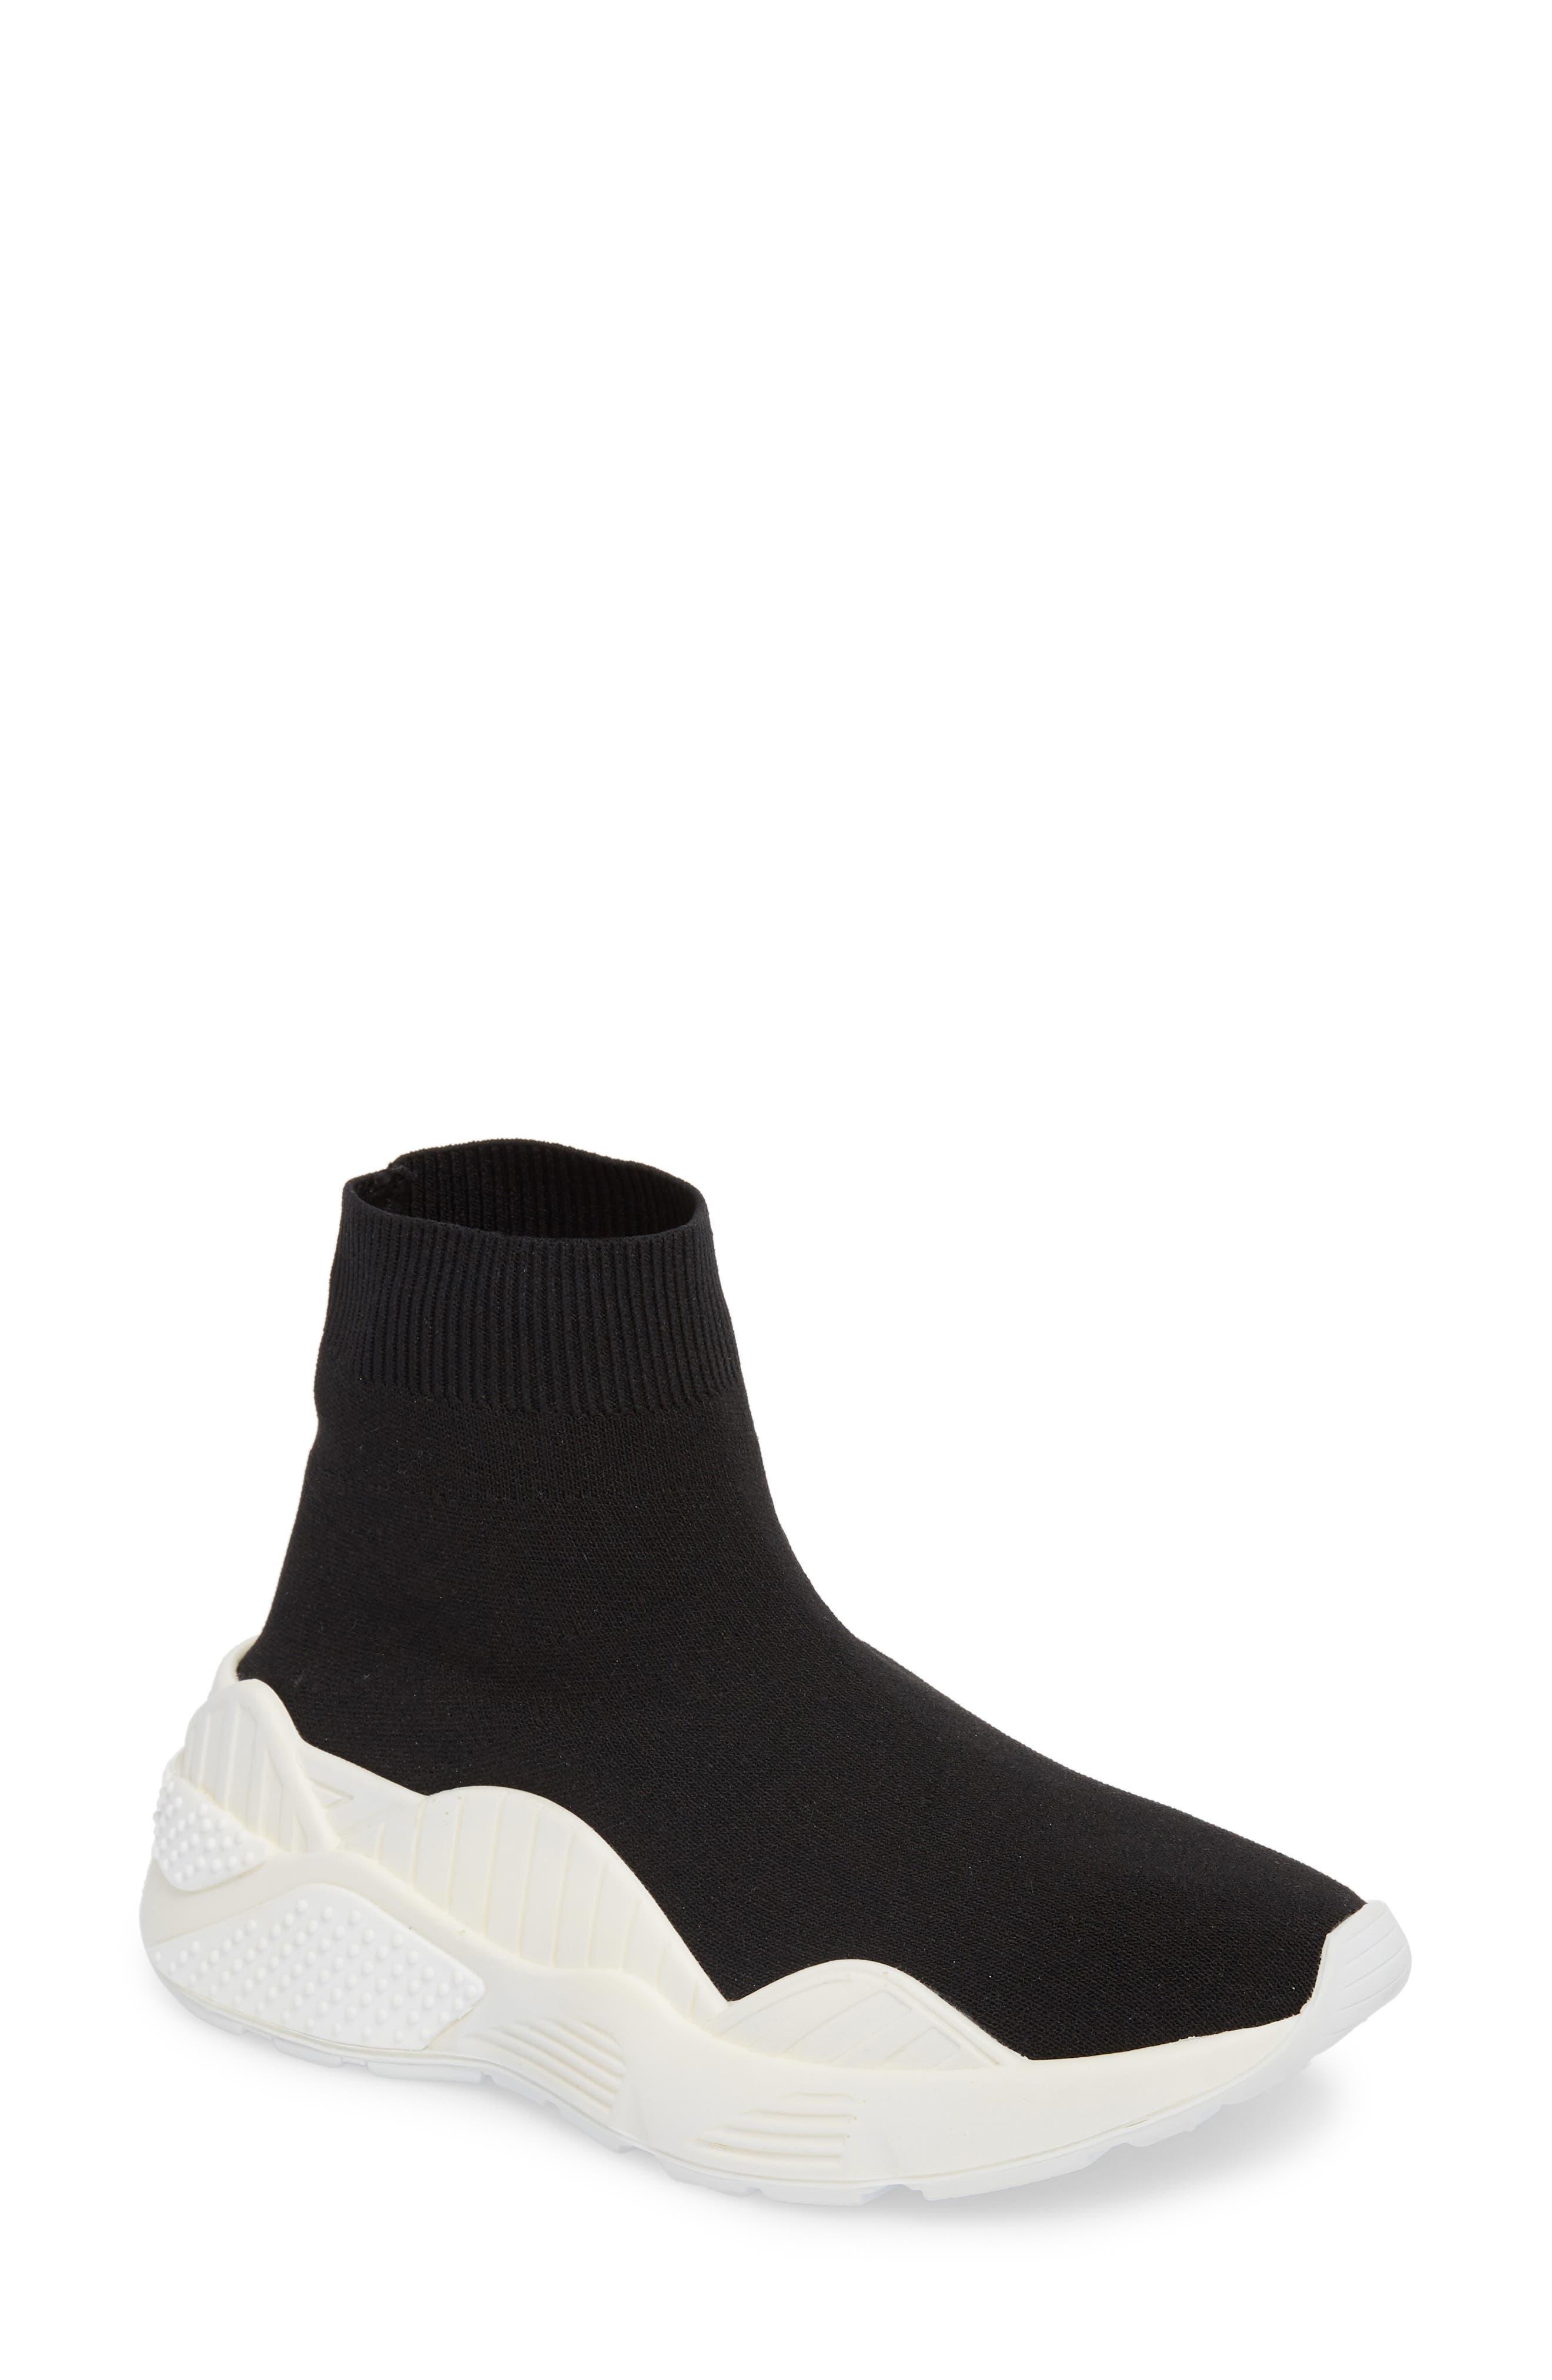 Lunix Sock Sneaker,                         Main,                         color, Black/ White Leather